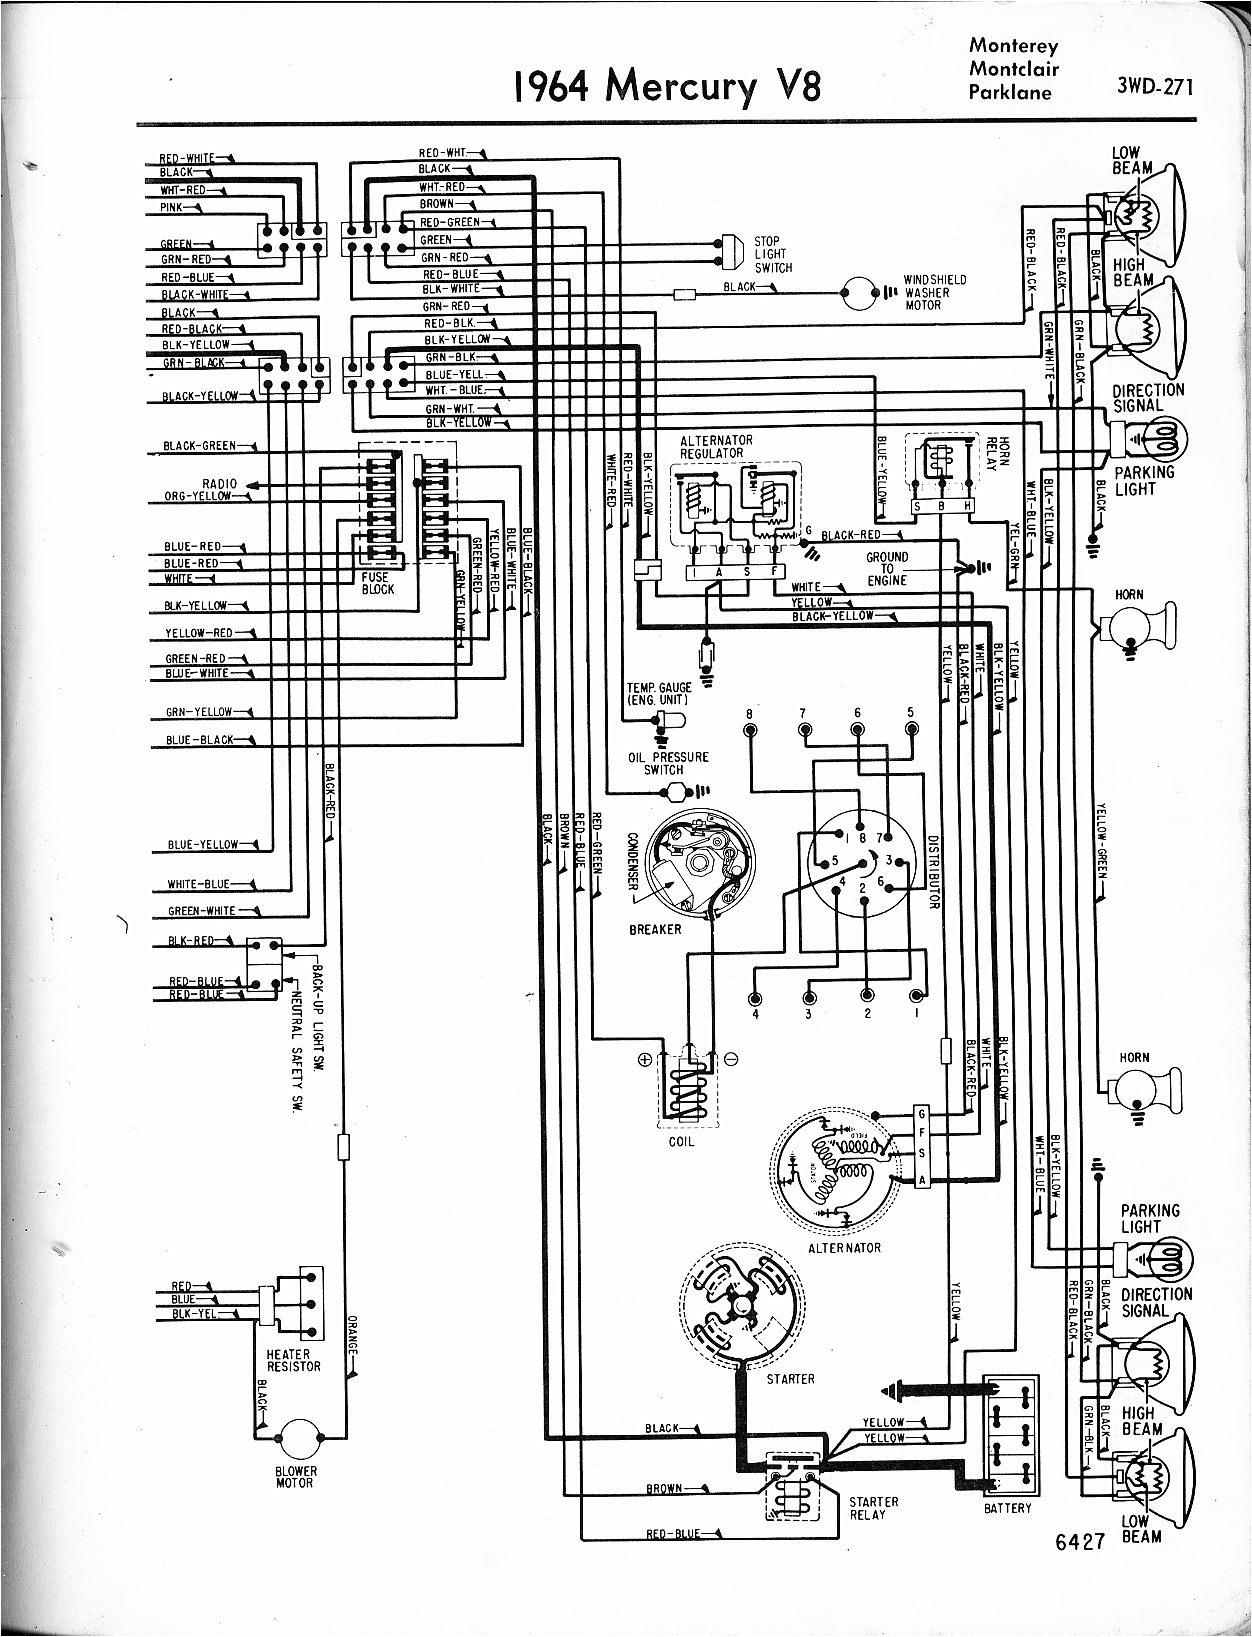 1966 ford Fairlane Wiring Diagram 1956 Thunderbird Wiring Diagram Pdf Wiring Diagram